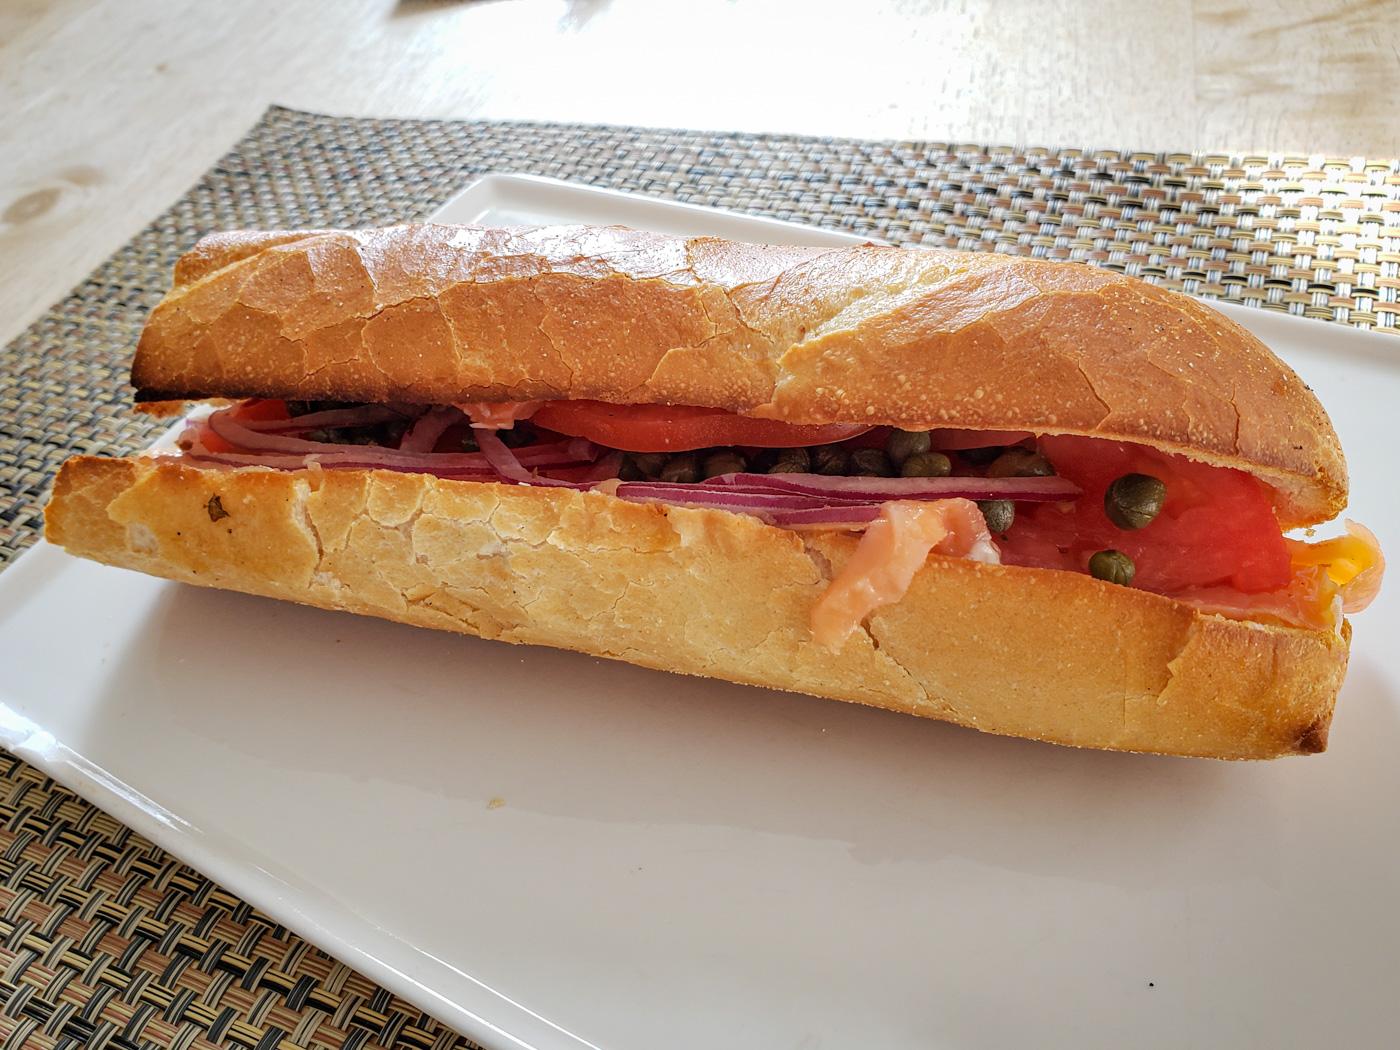 Lox, Tomato, Red Onion, and Caper Sandwich from Cafe Lutecia